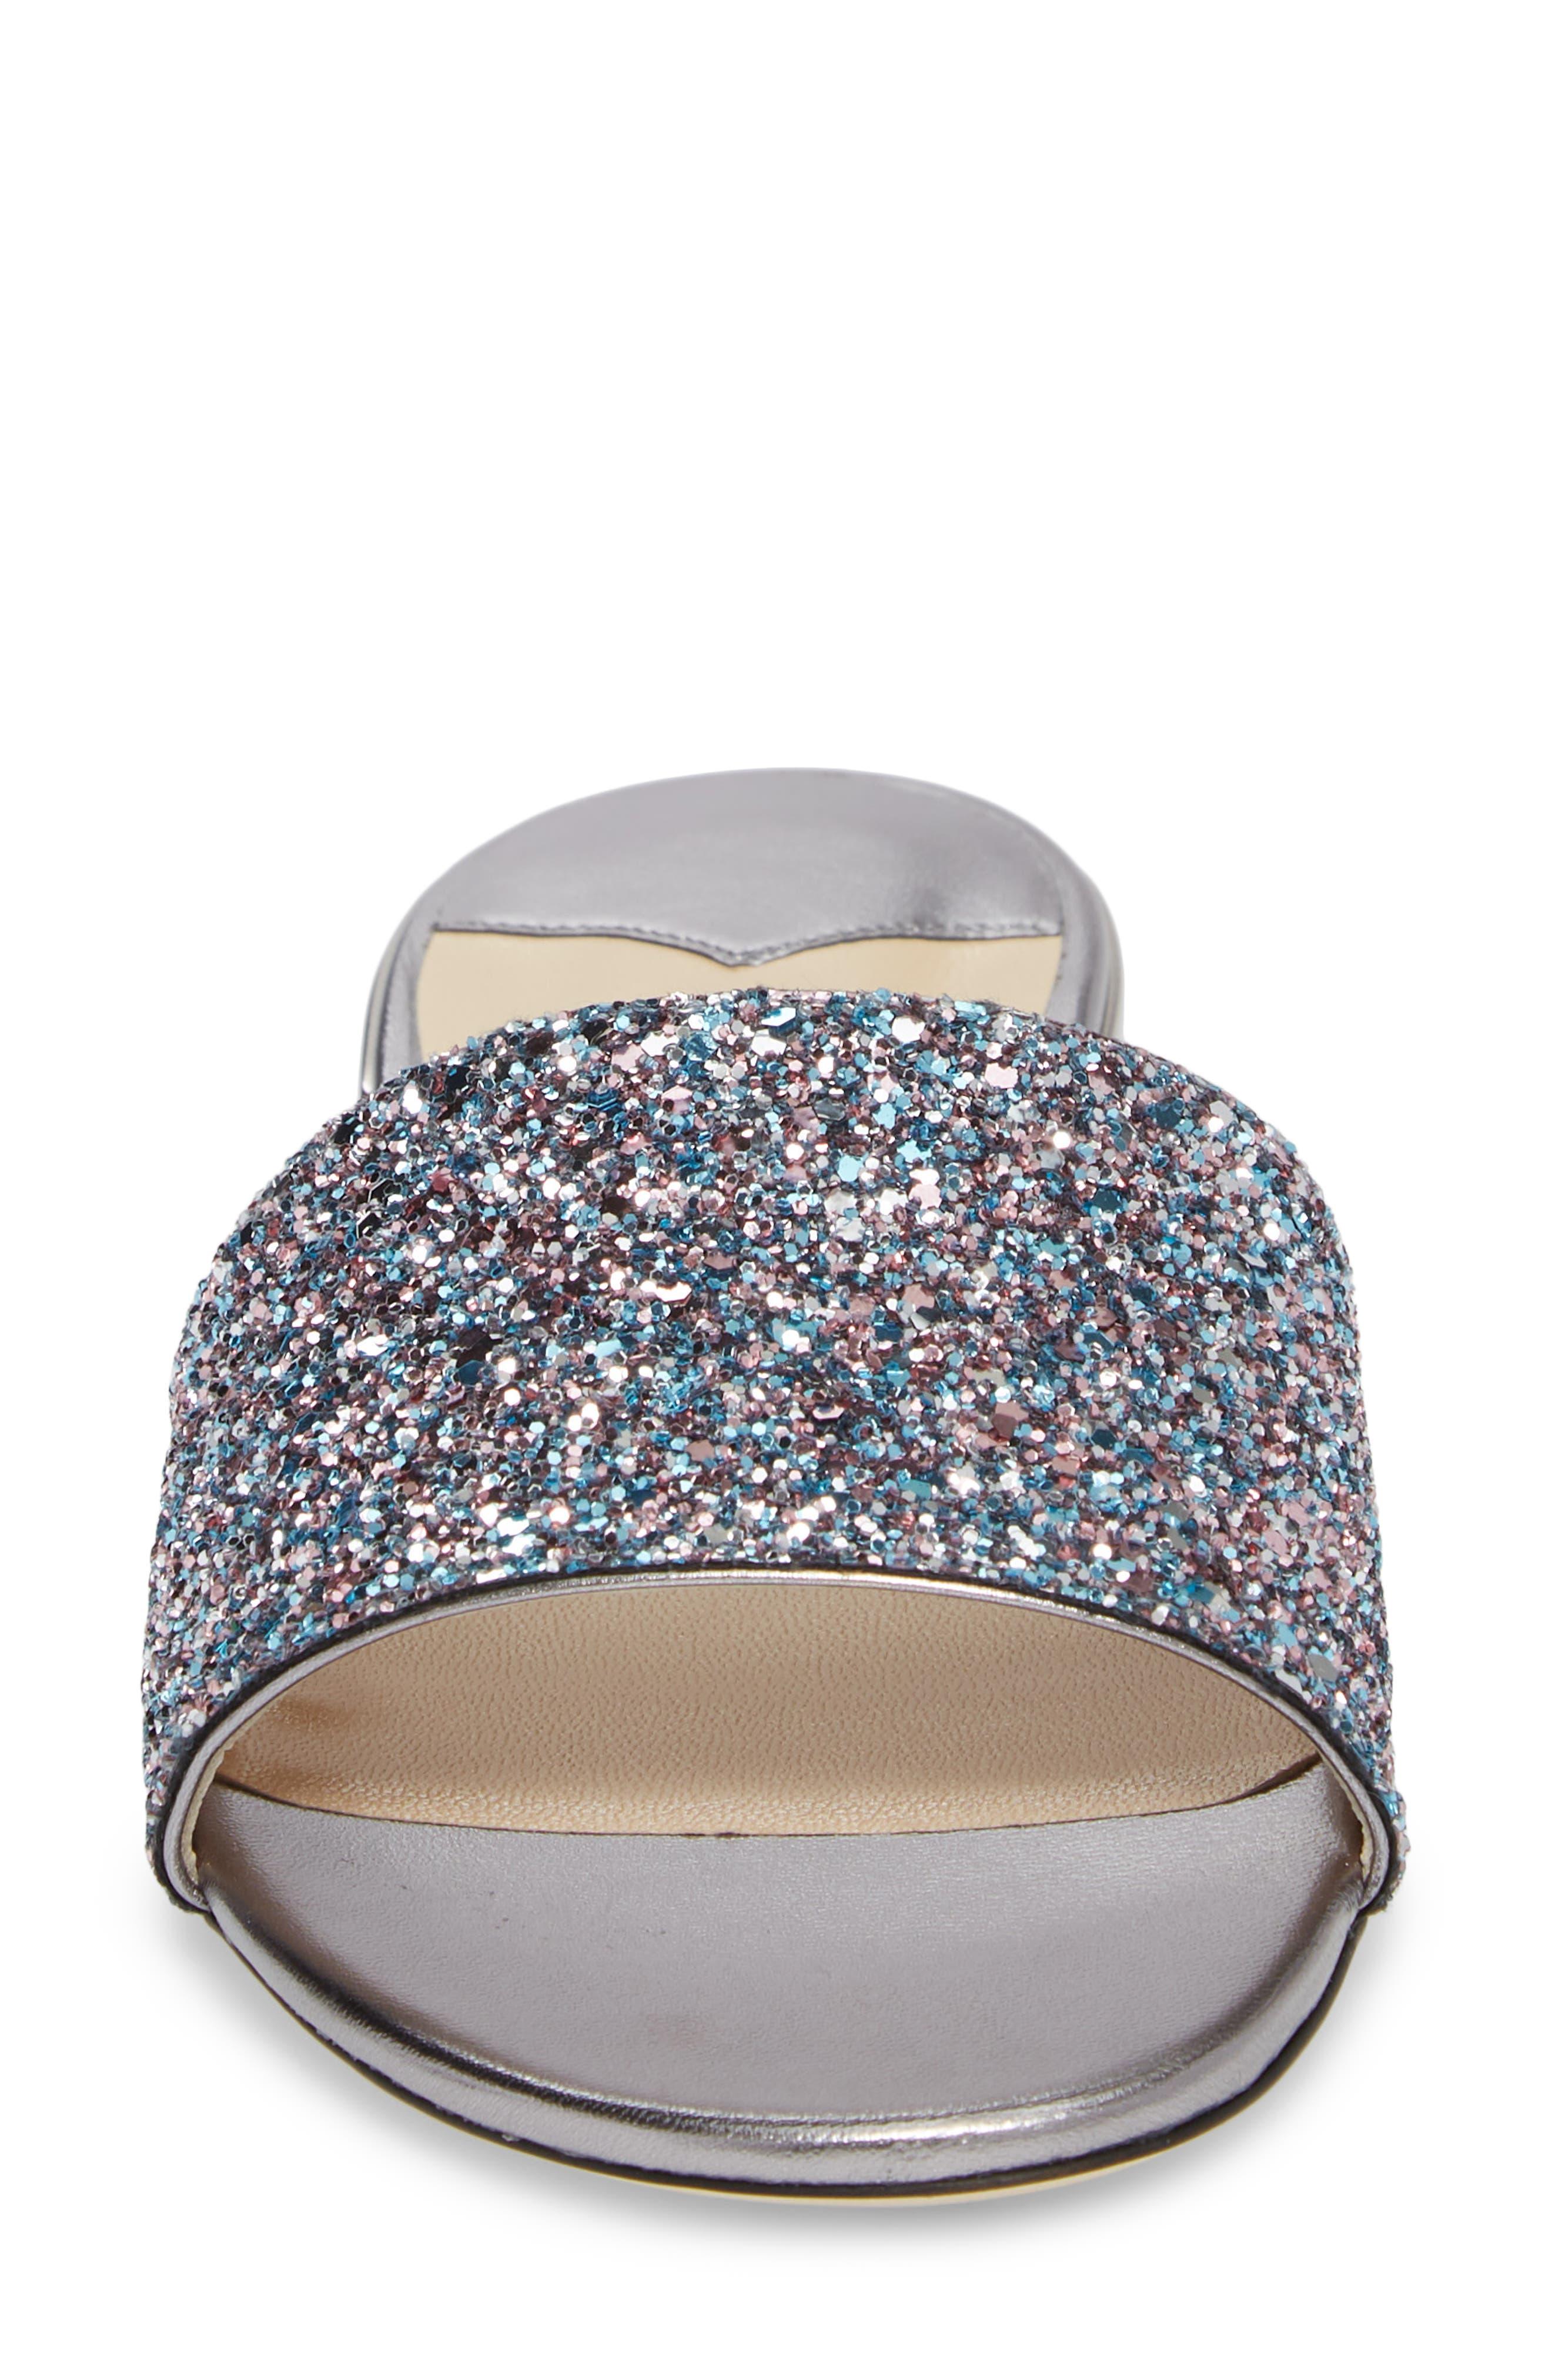 Joni Embellished Slide Sandal,                             Alternate thumbnail 4, color,                             Blush Silver